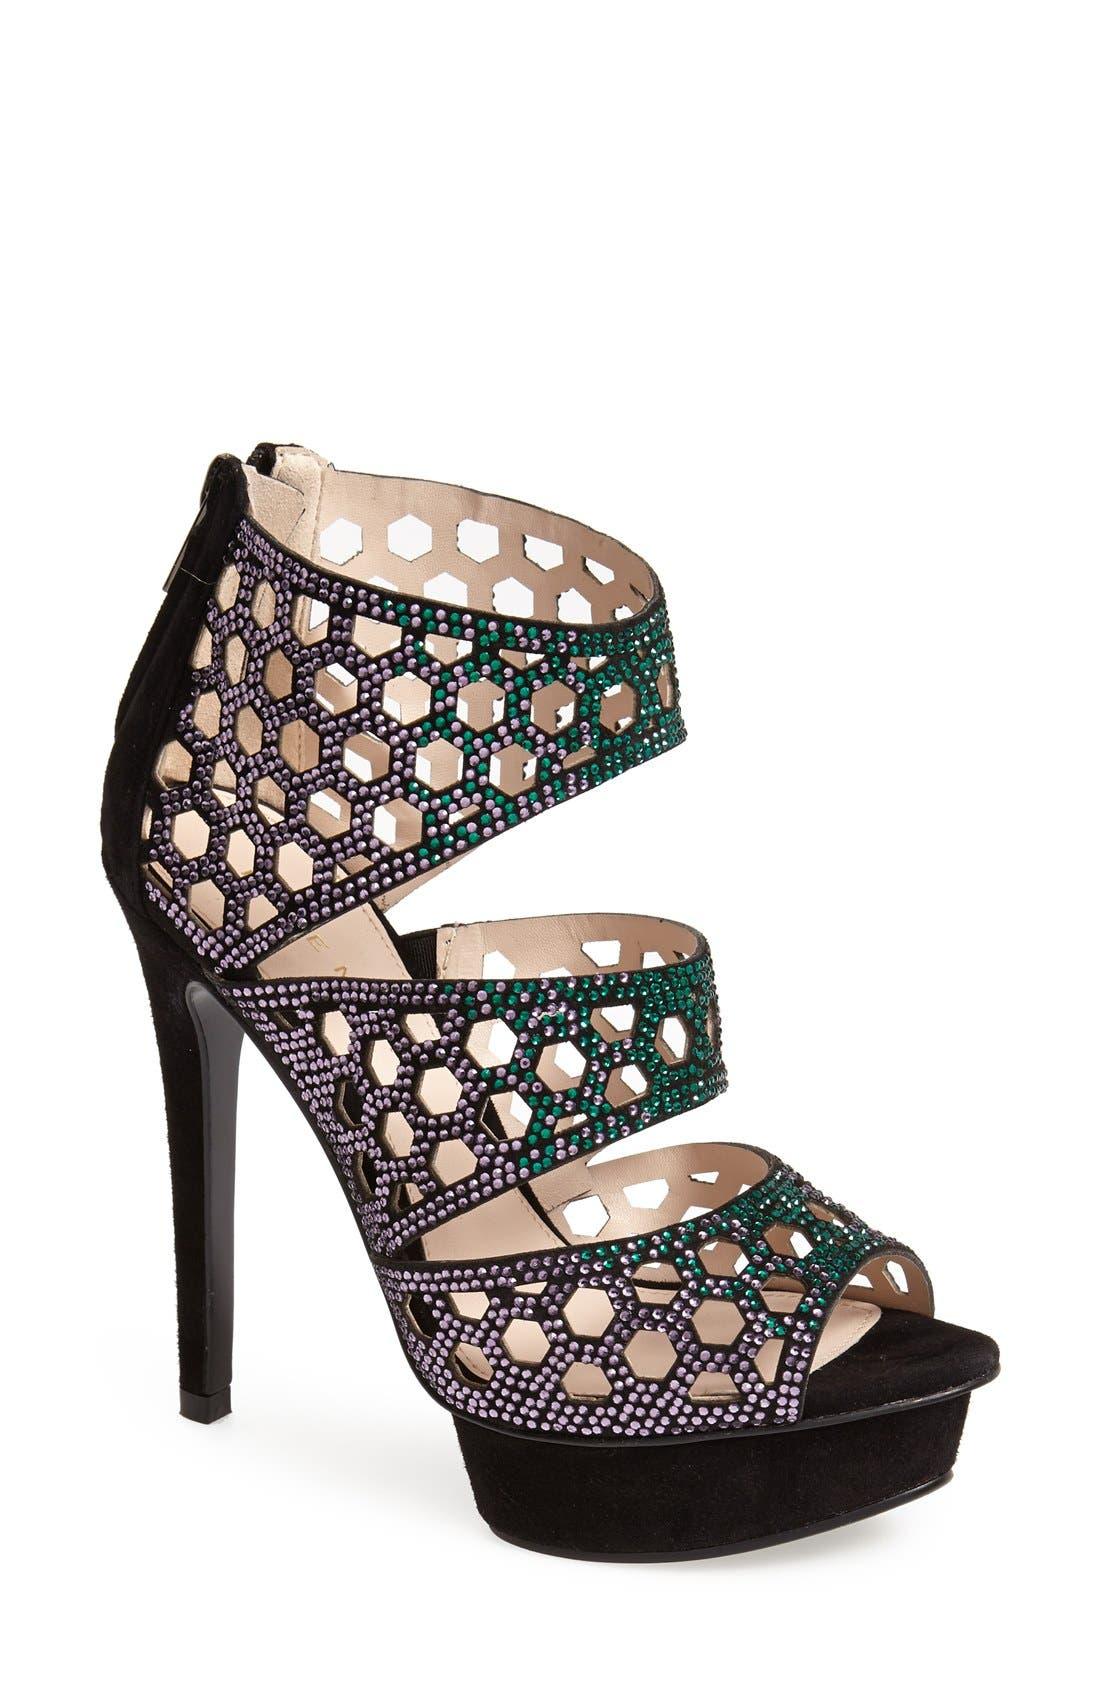 Main Image - Pelle Moda 'Mahal II' Platform Sandal (Women)